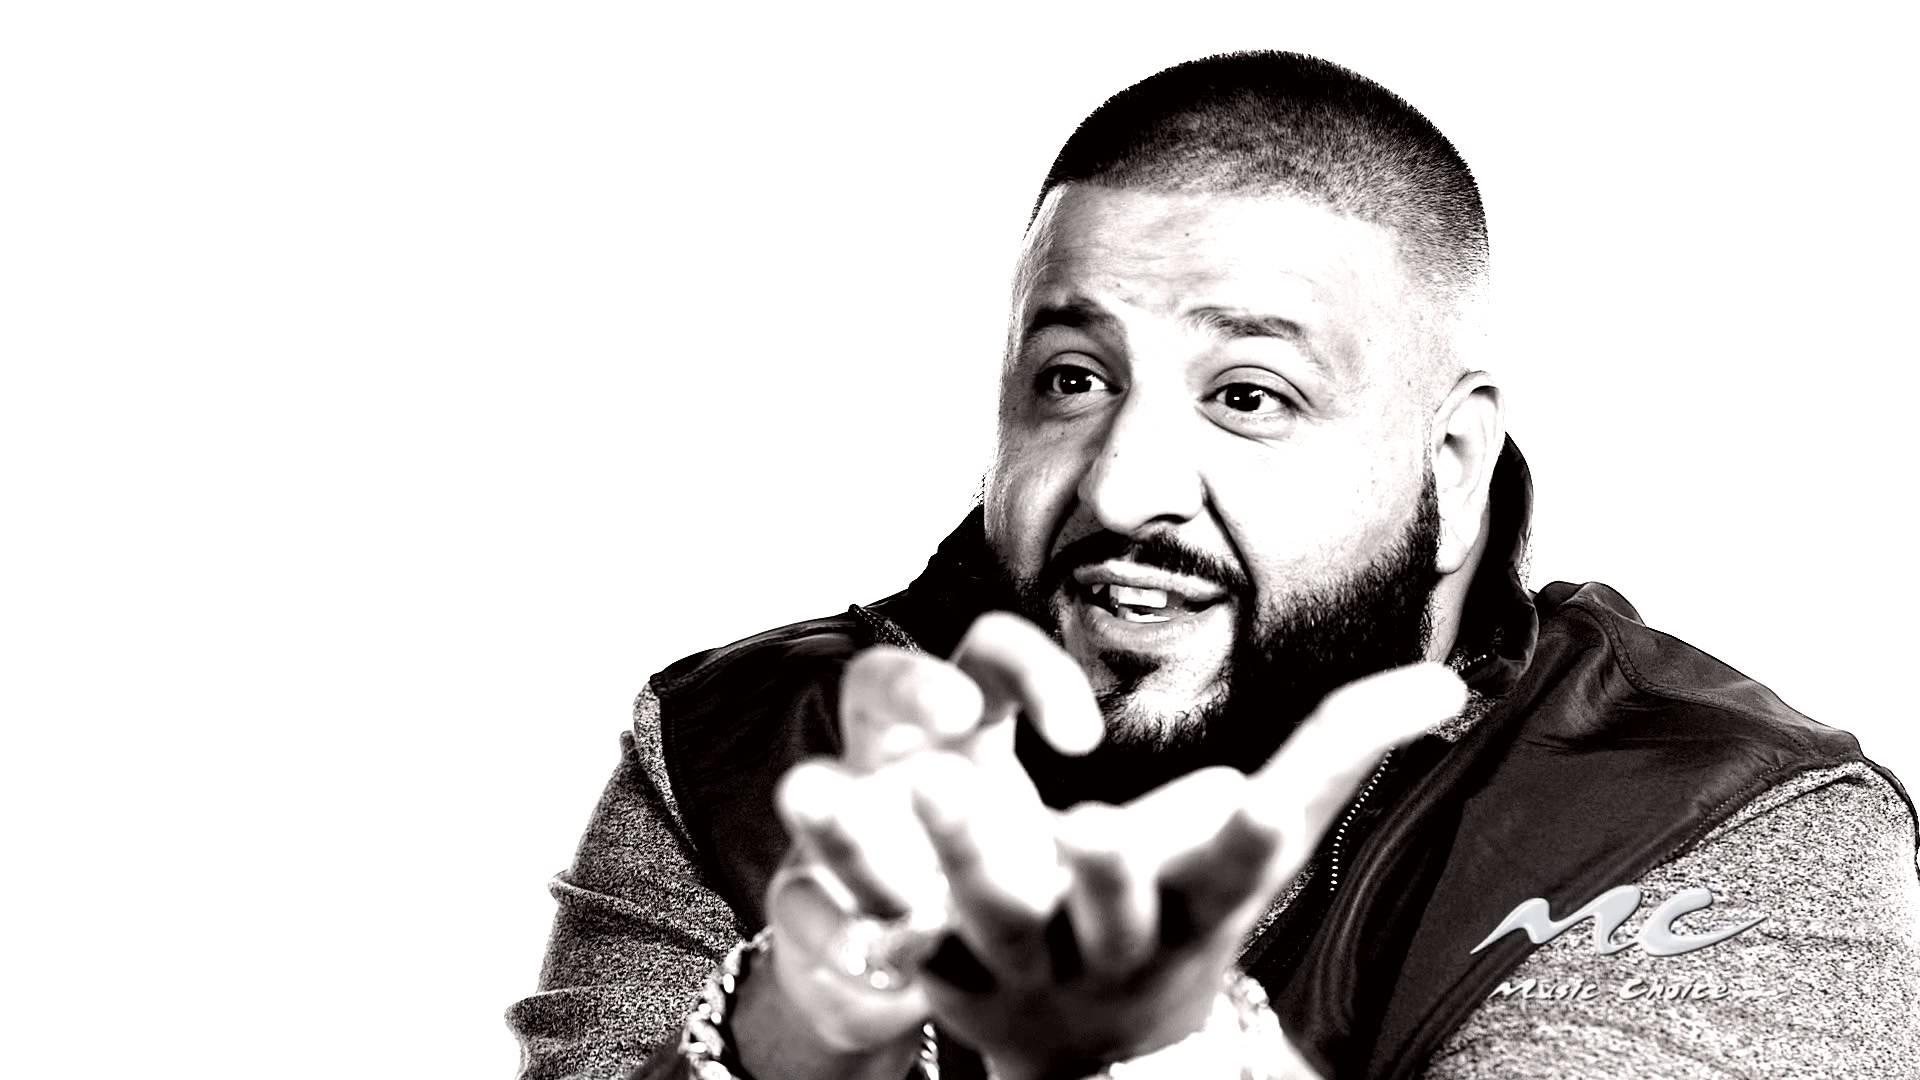 DJ Khaled to Perform at Dooley's Week Concert